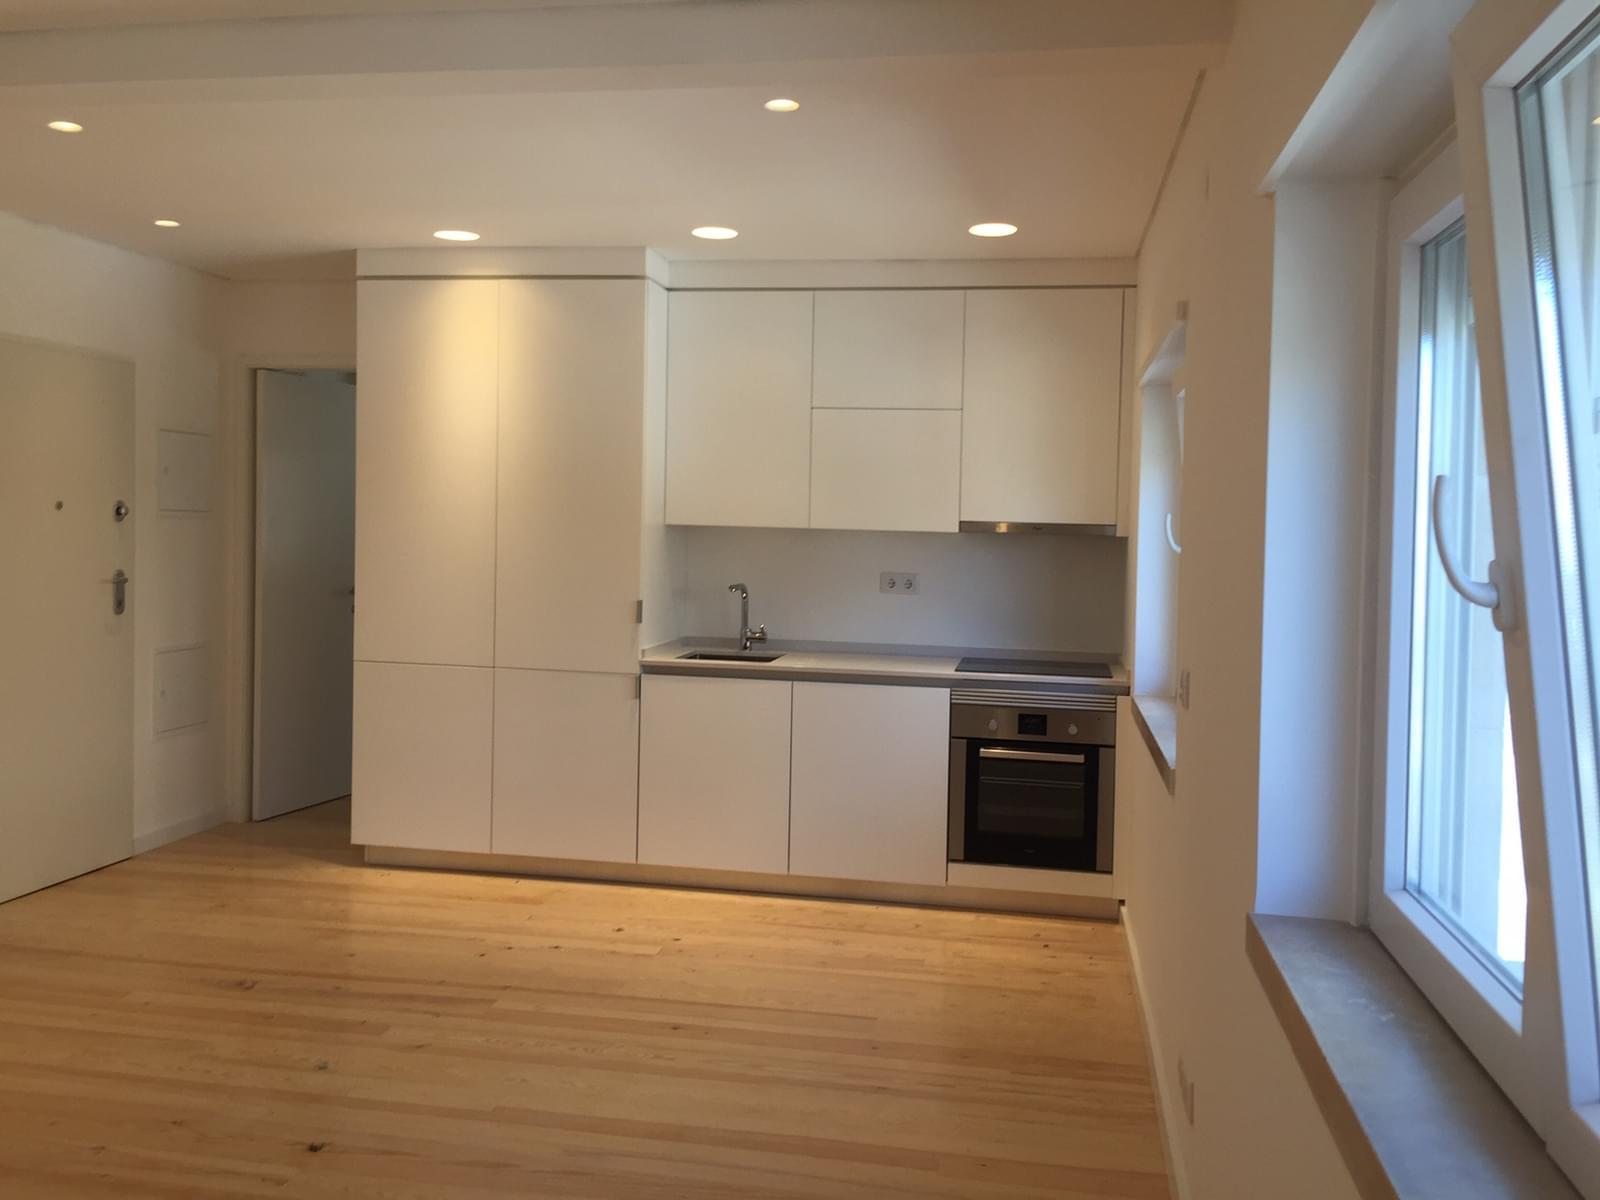 pf18802-apartamento-t1-lisboa-190e585a-7bb6-4842-8abb-13a9c8cf5c27